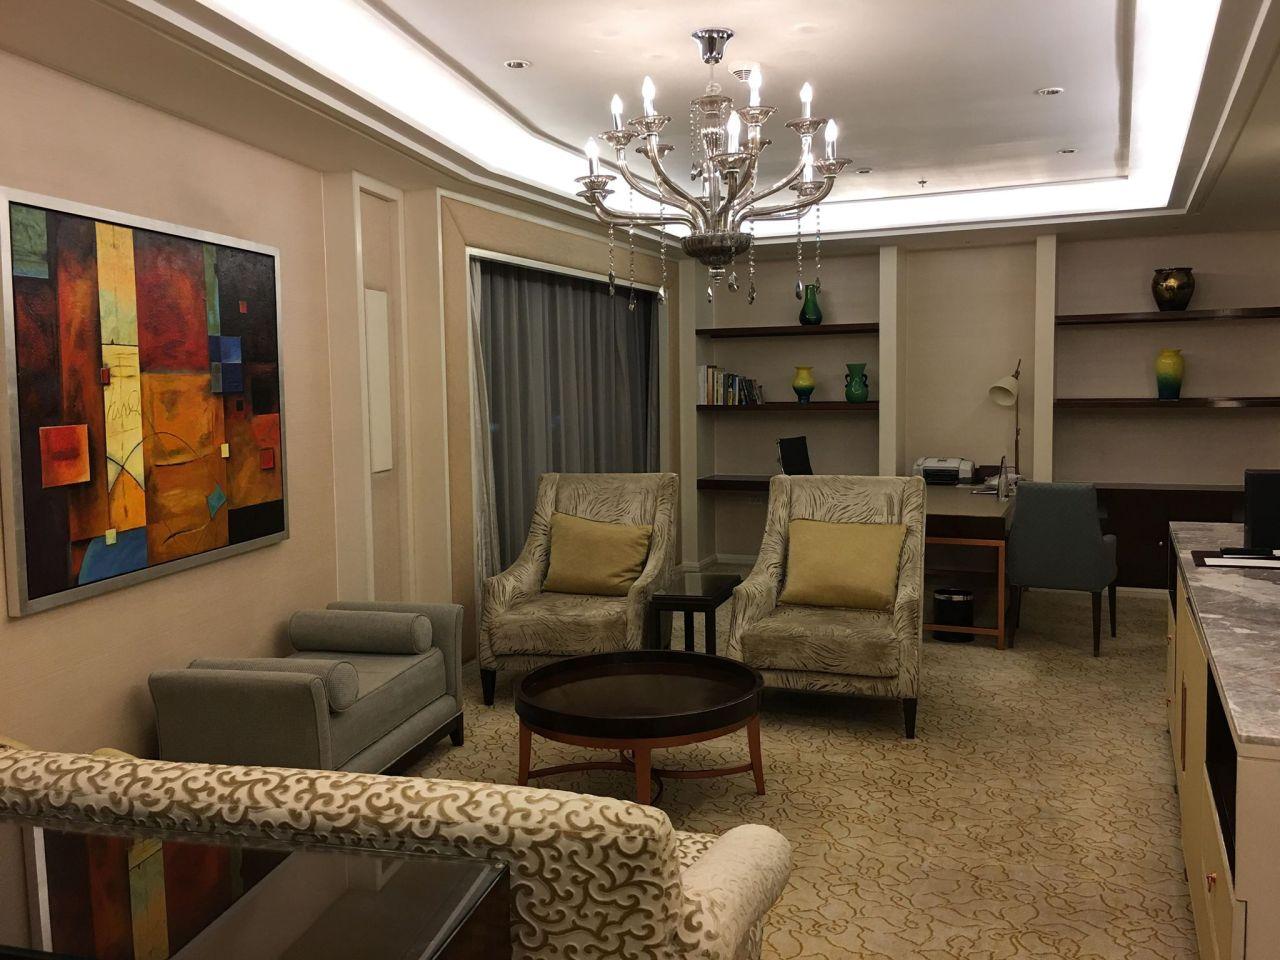 The living room at the EDSA Shangri-la Hotel